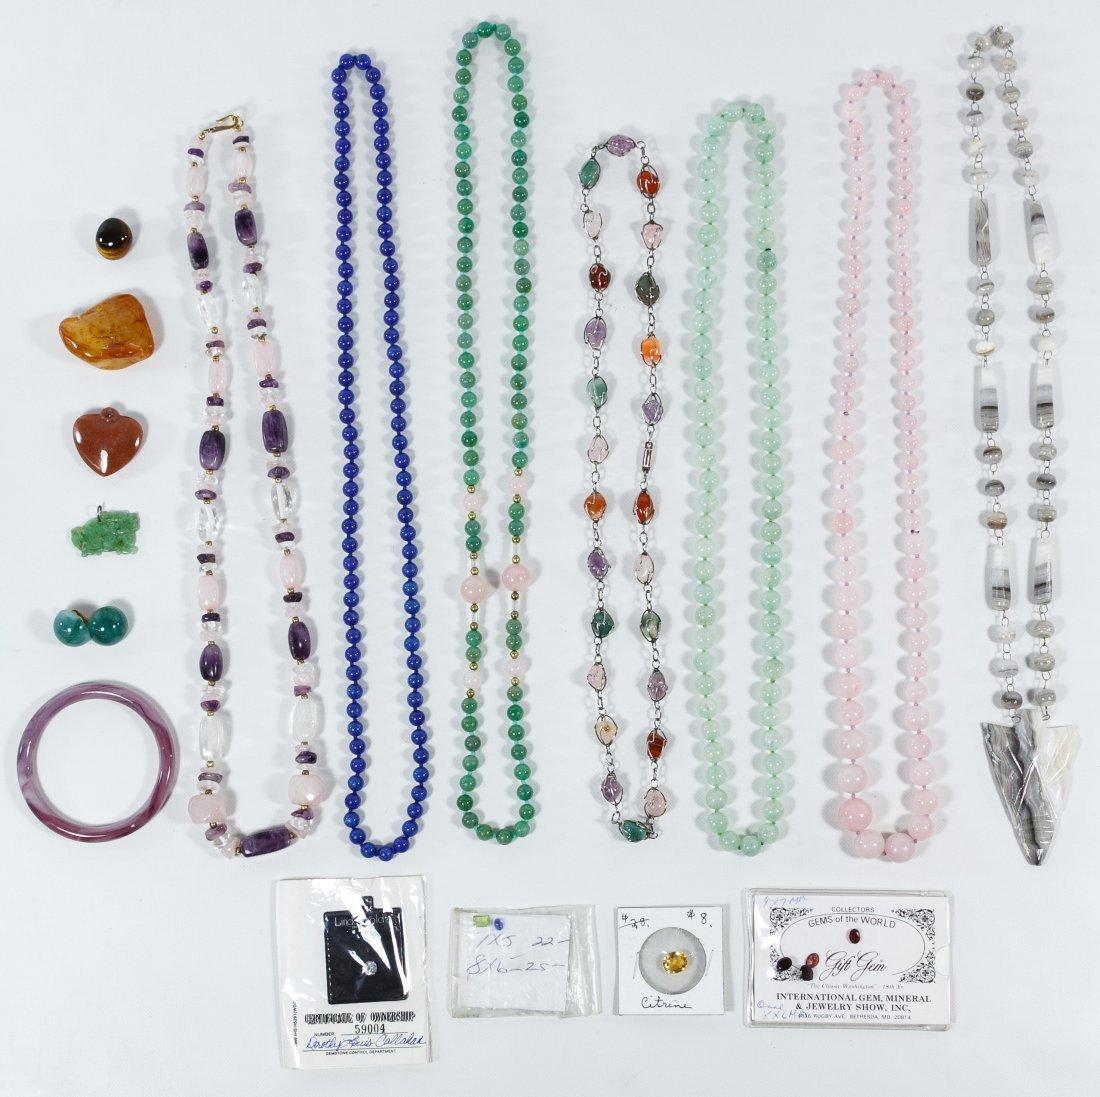 Gemstone and Stone Jewelry Assortment